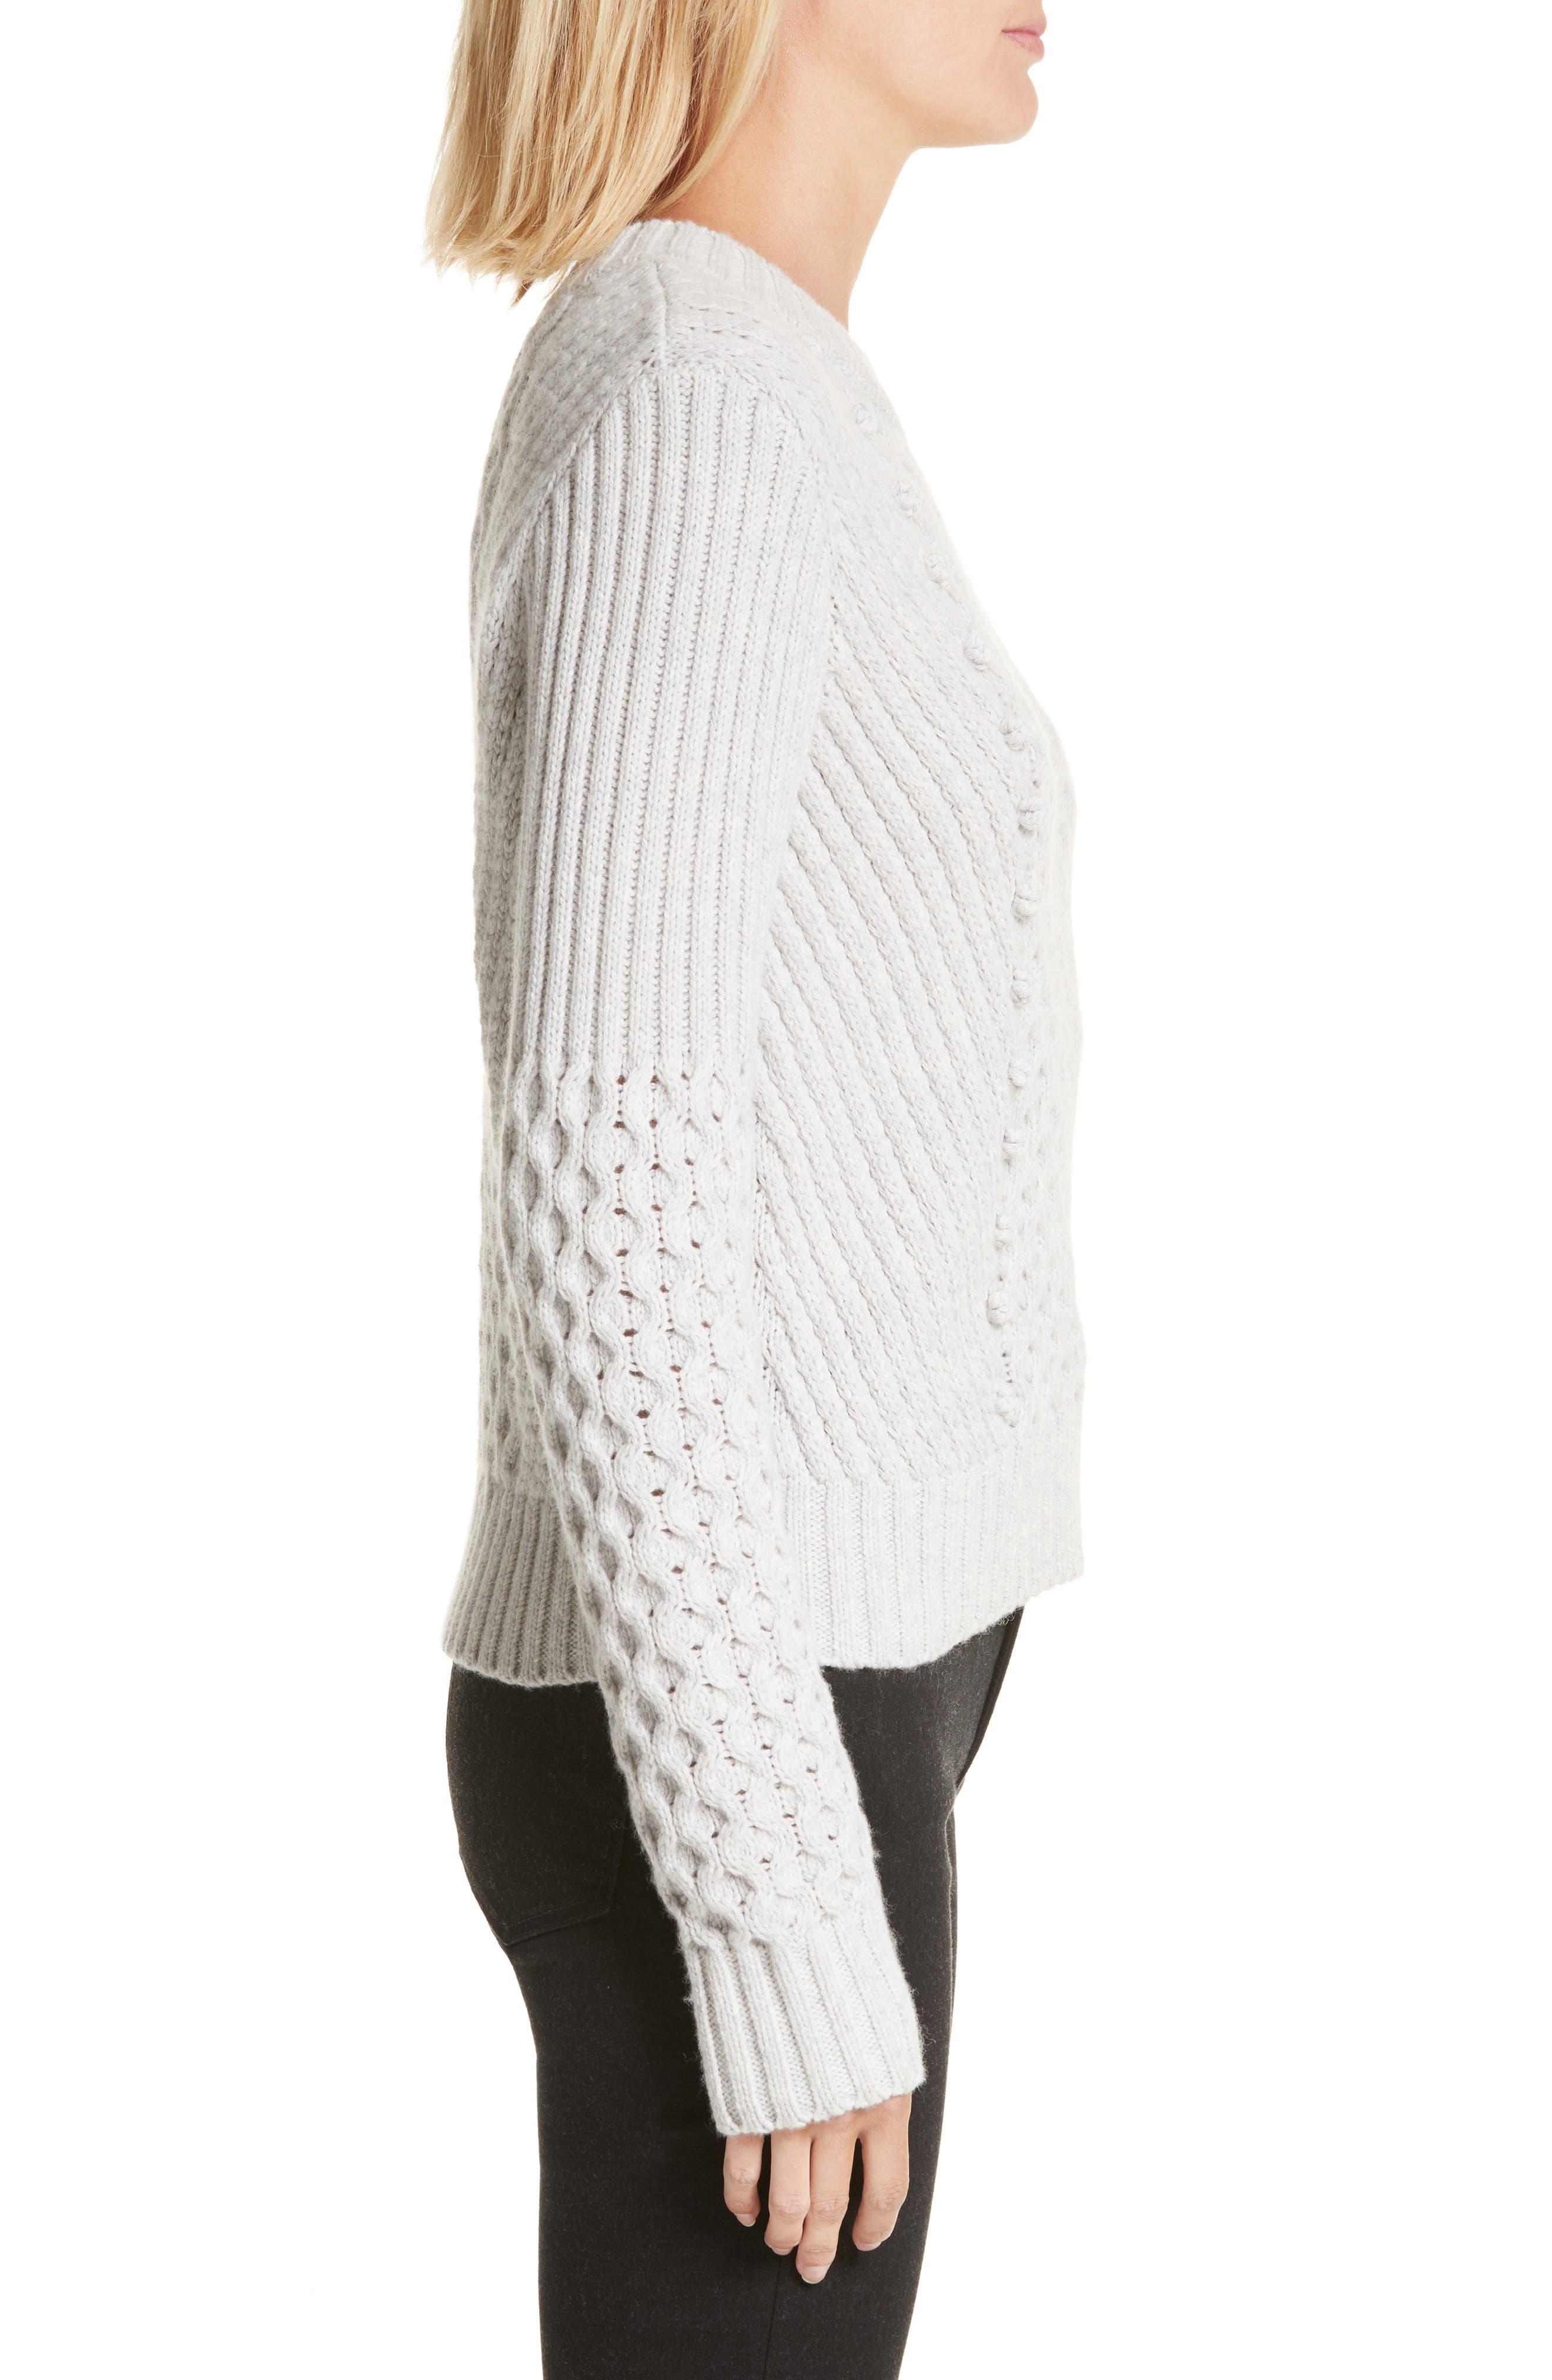 Honeycomb Stitch Sweater,                             Alternate thumbnail 3, color,                             Light Grey Heather